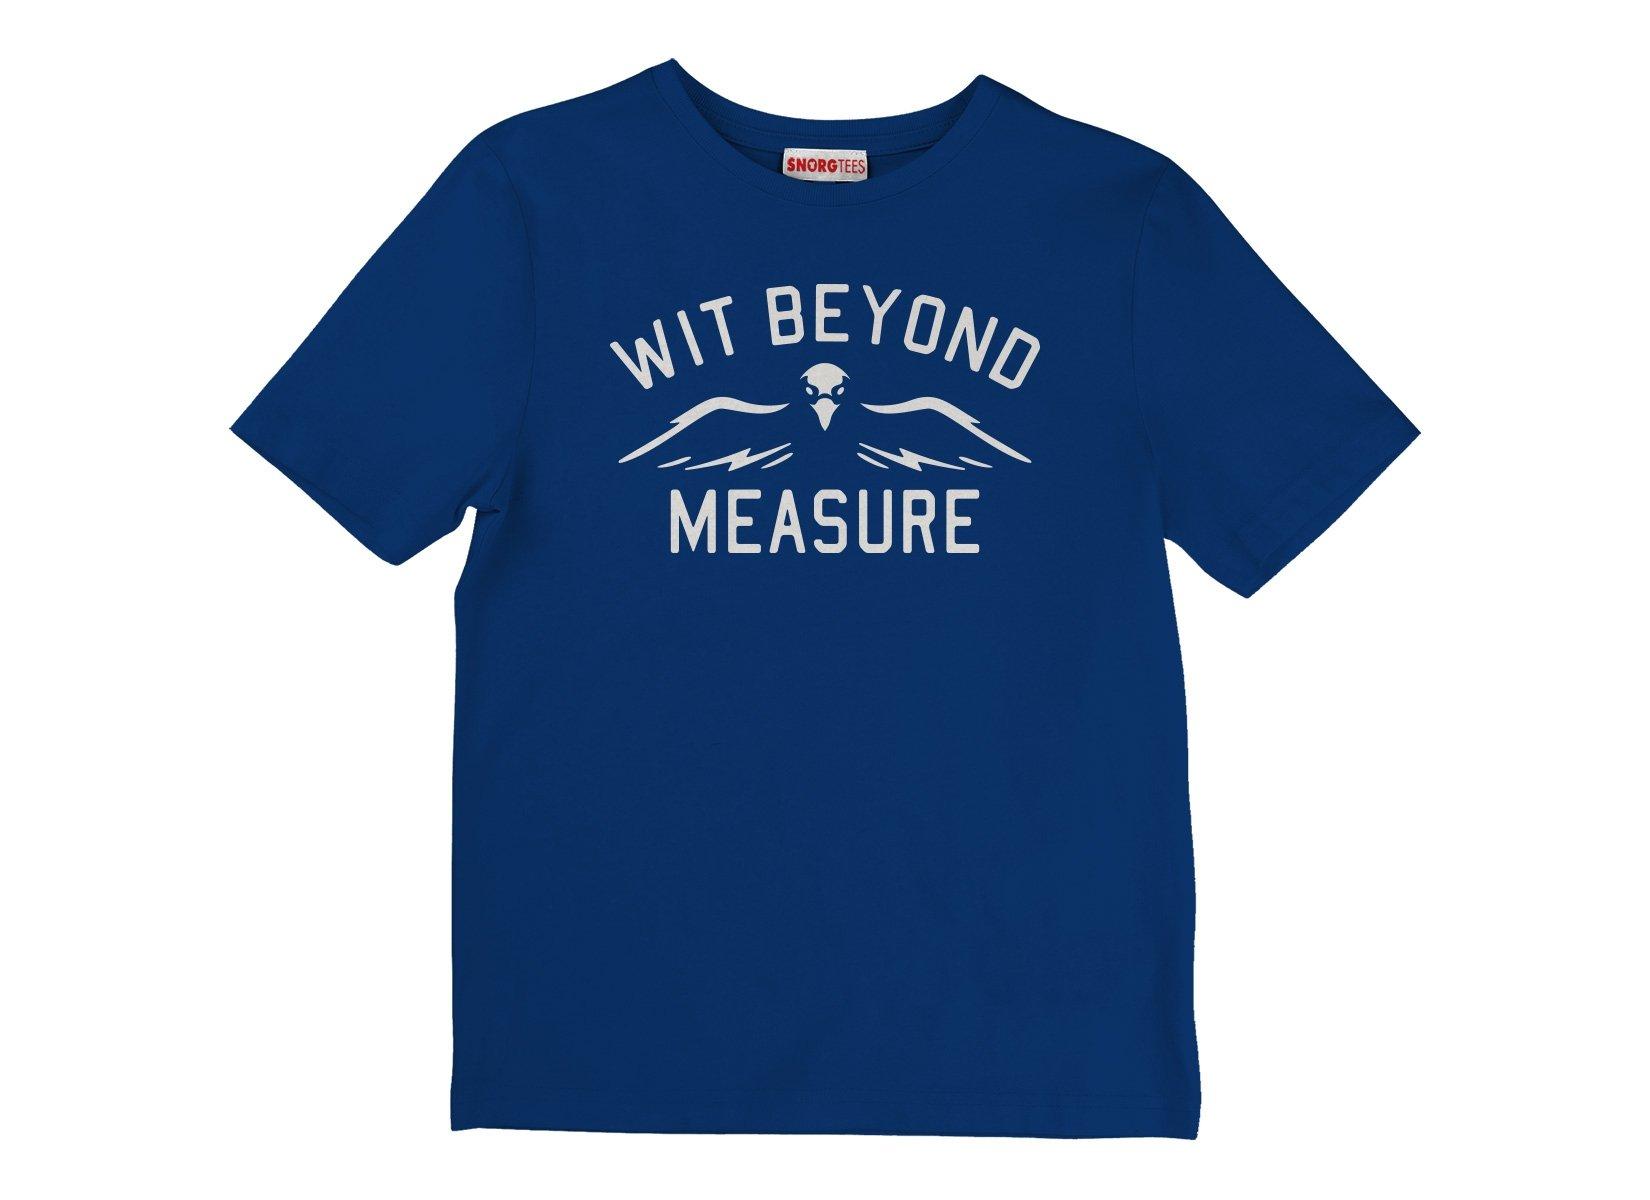 Wit Beyond Measure on Kids T-Shirt